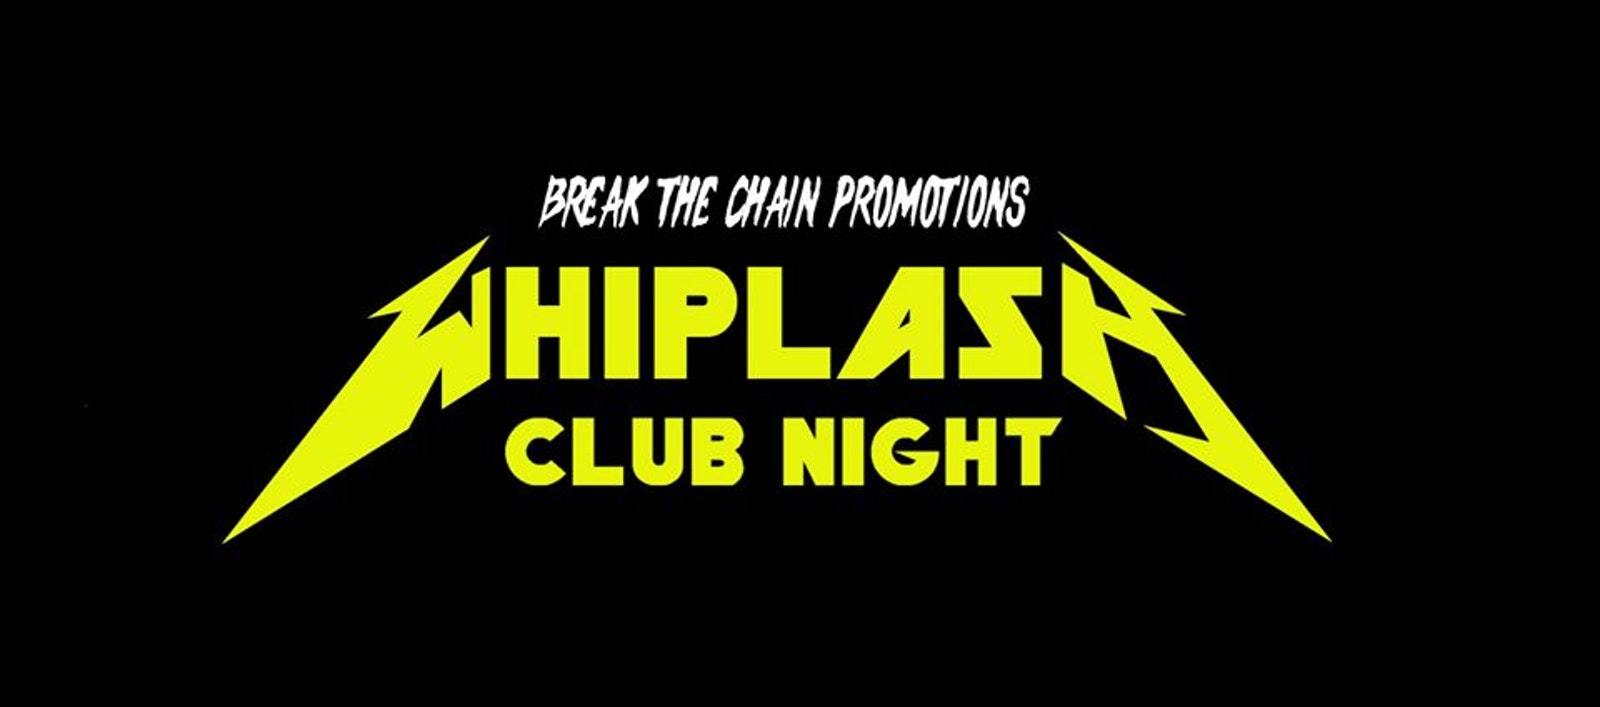 Whiplash Club Night